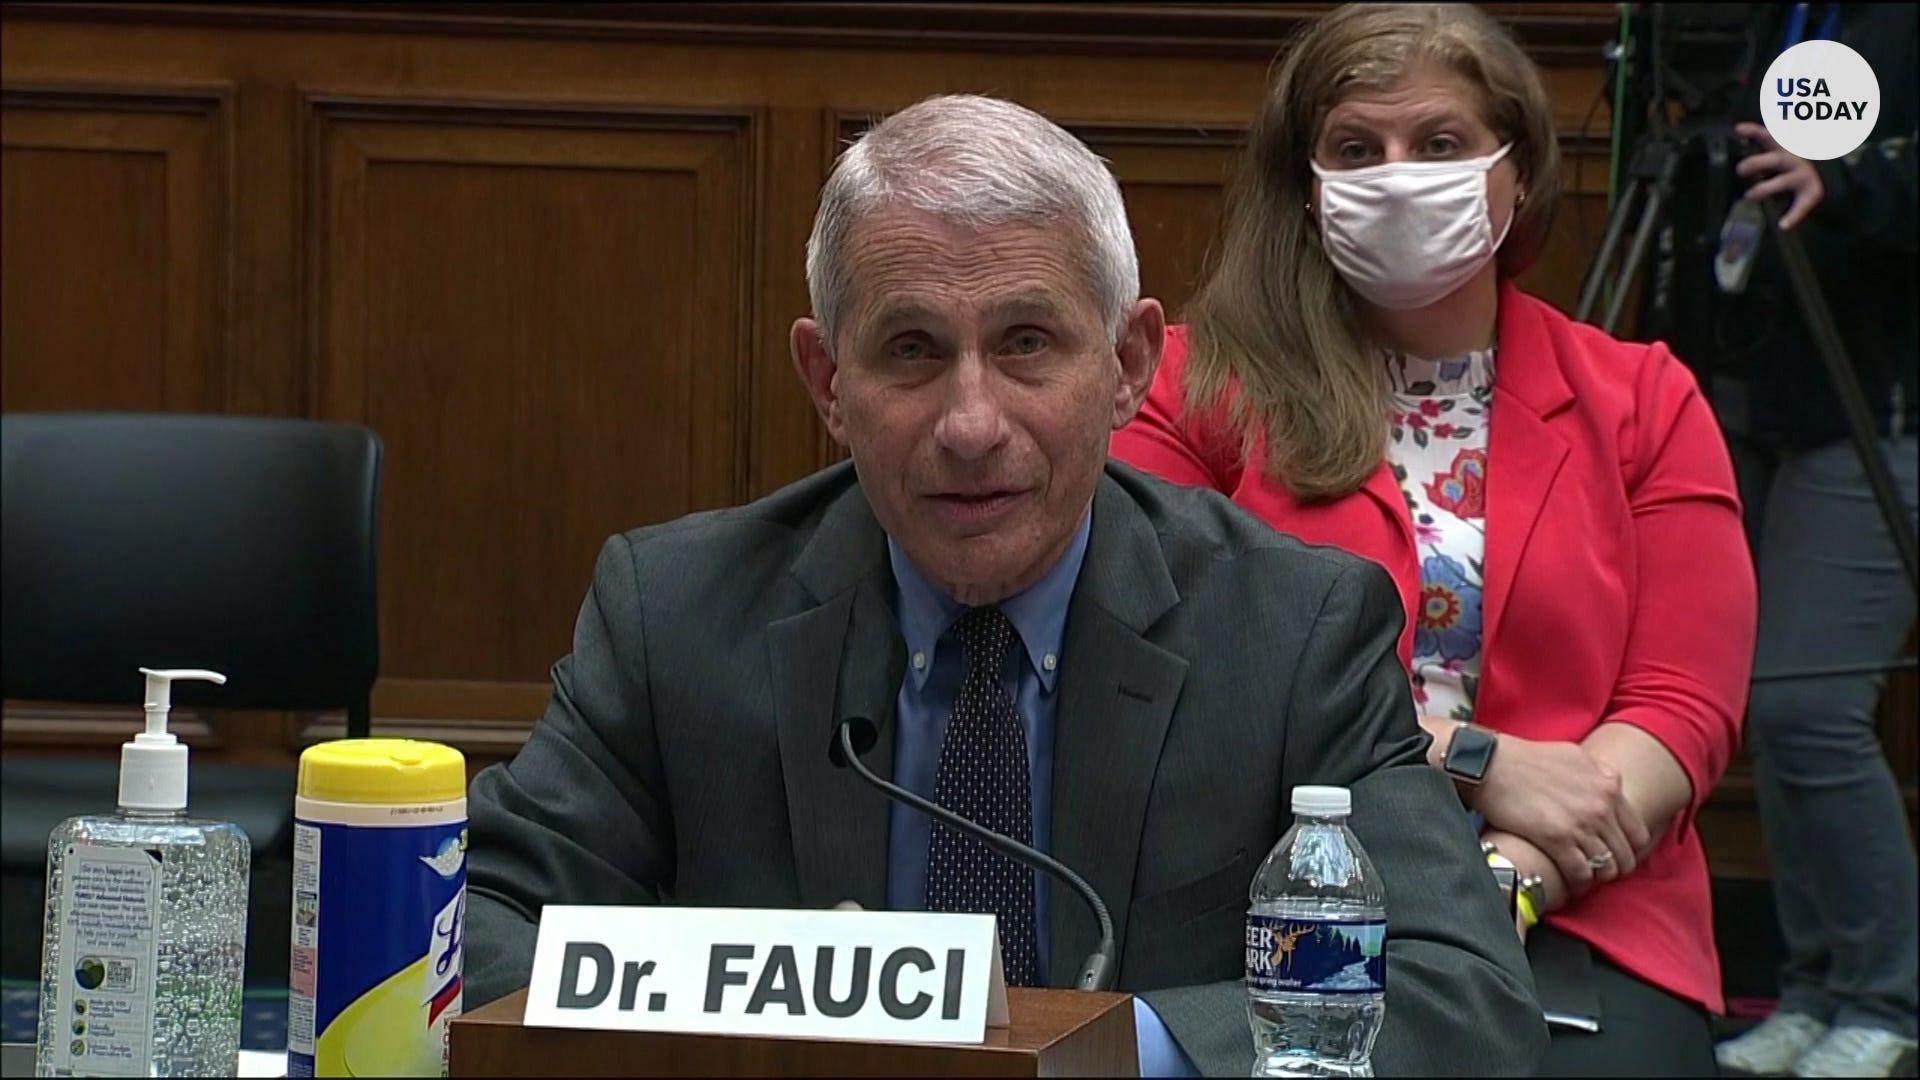 Fauci to testify before Congress on state of coronavirus pandemic